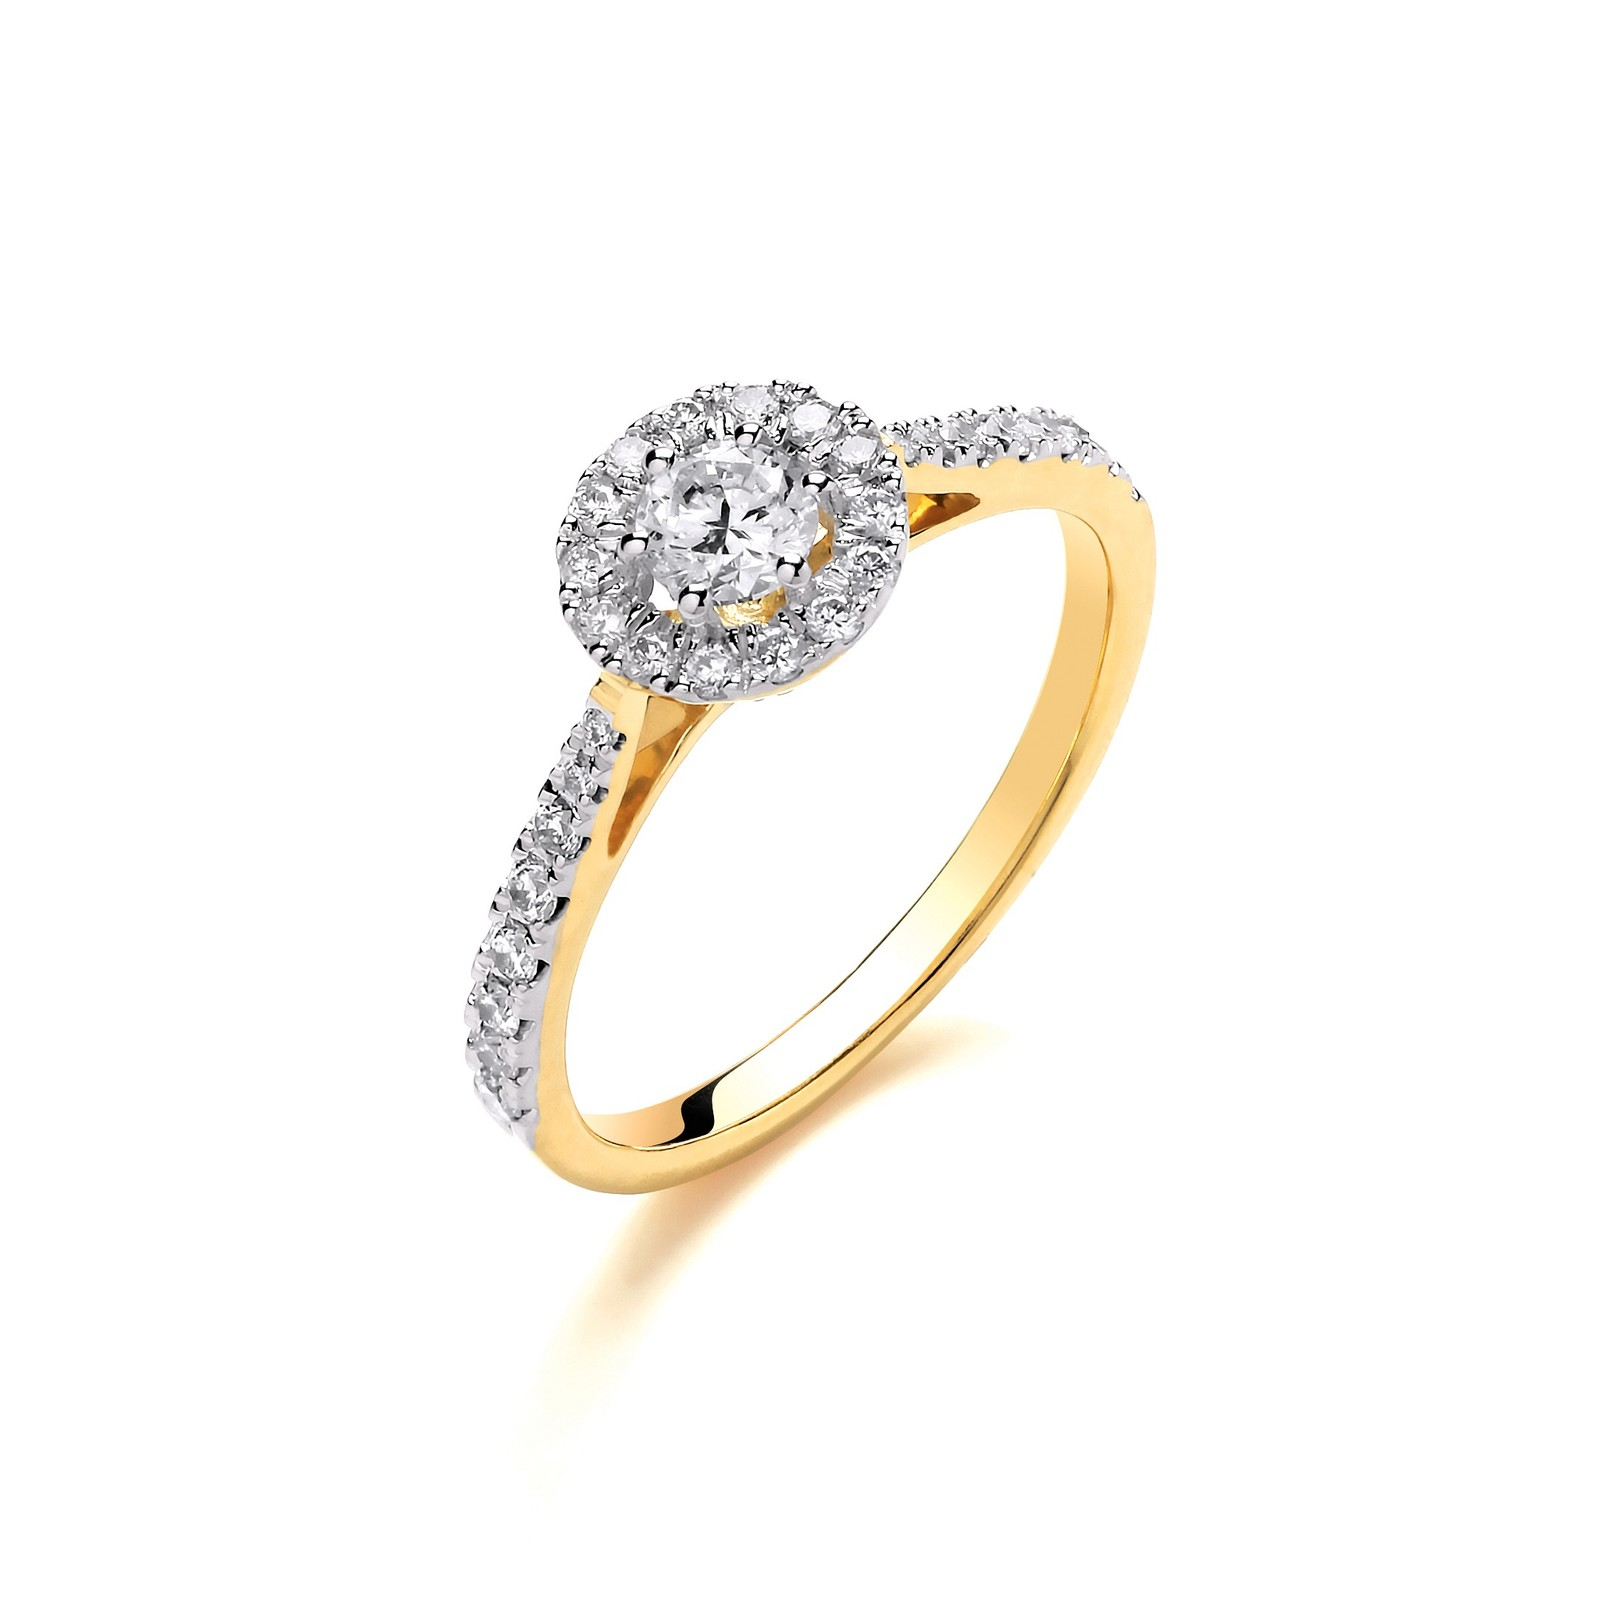 18ct Yellow Gold Halo Style 0.50ct Diamond Ring